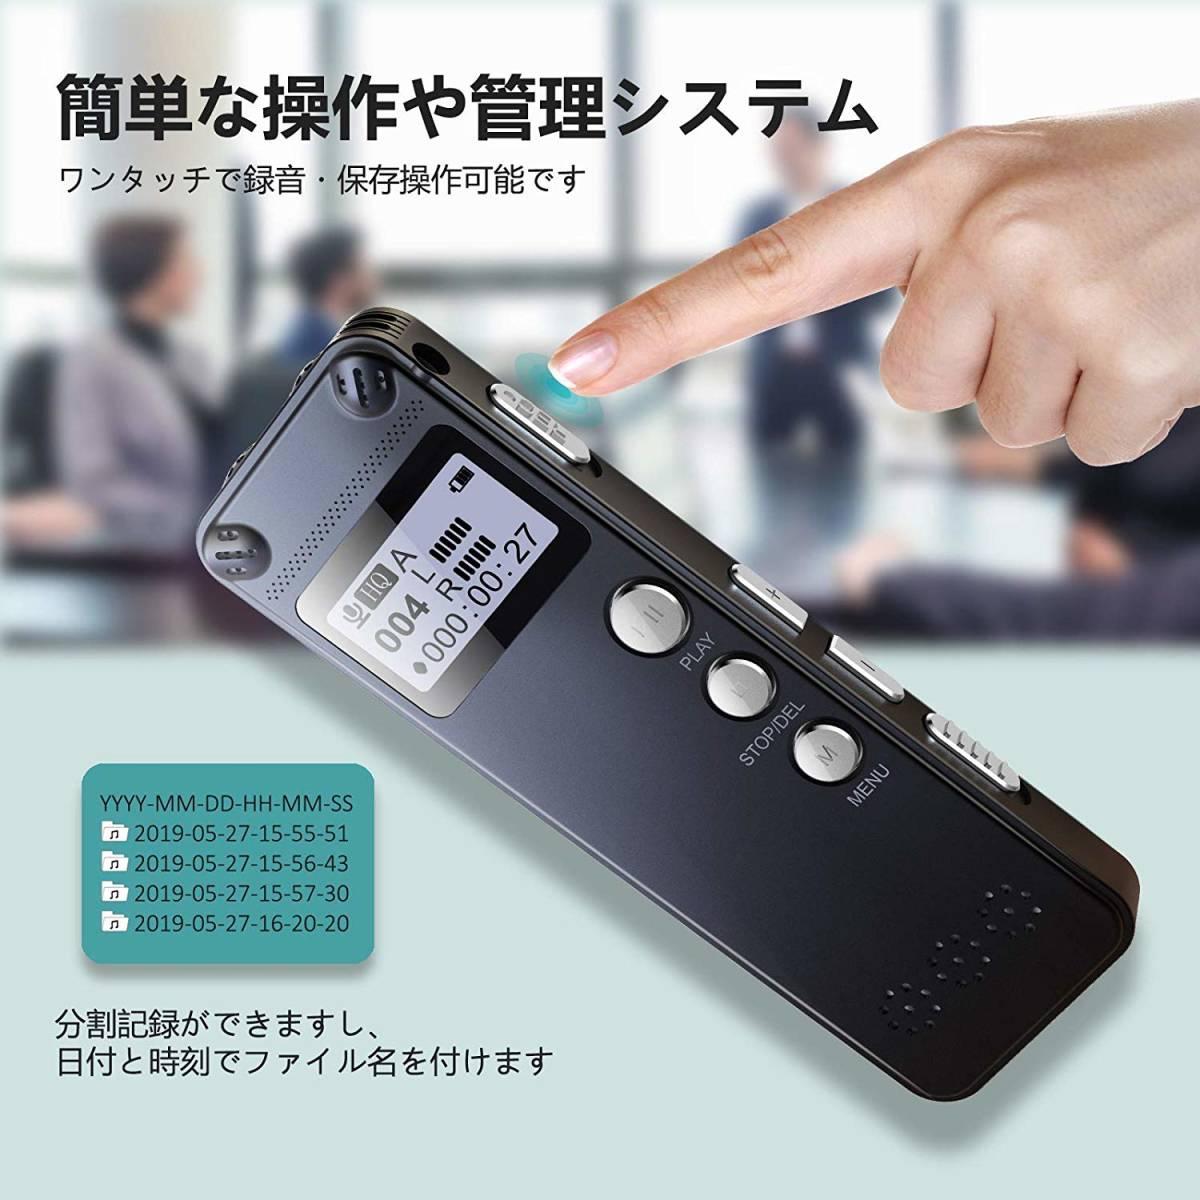 O991 新品 ボイスレコーダー ICレコーダー ノイズリダクション録音機 小型軽量MP3 高音質 大容量長時間録音 音声検出 定時録音_画像6